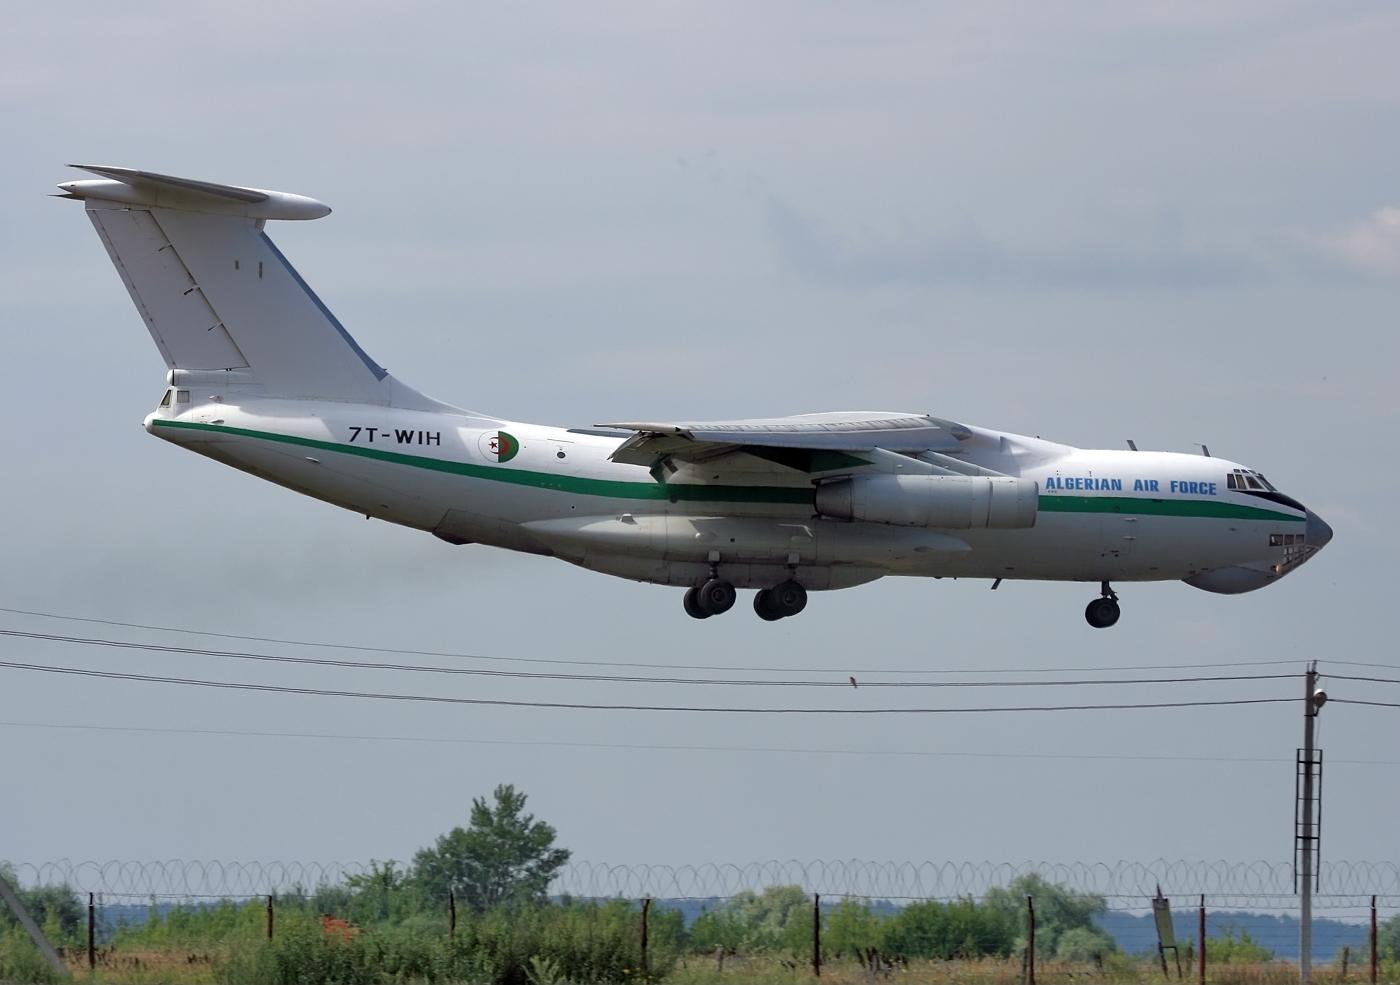 AAF - Transport / Refueling Ilyushin_IL-78_(7T-WIH)_Algerian_Air_Force